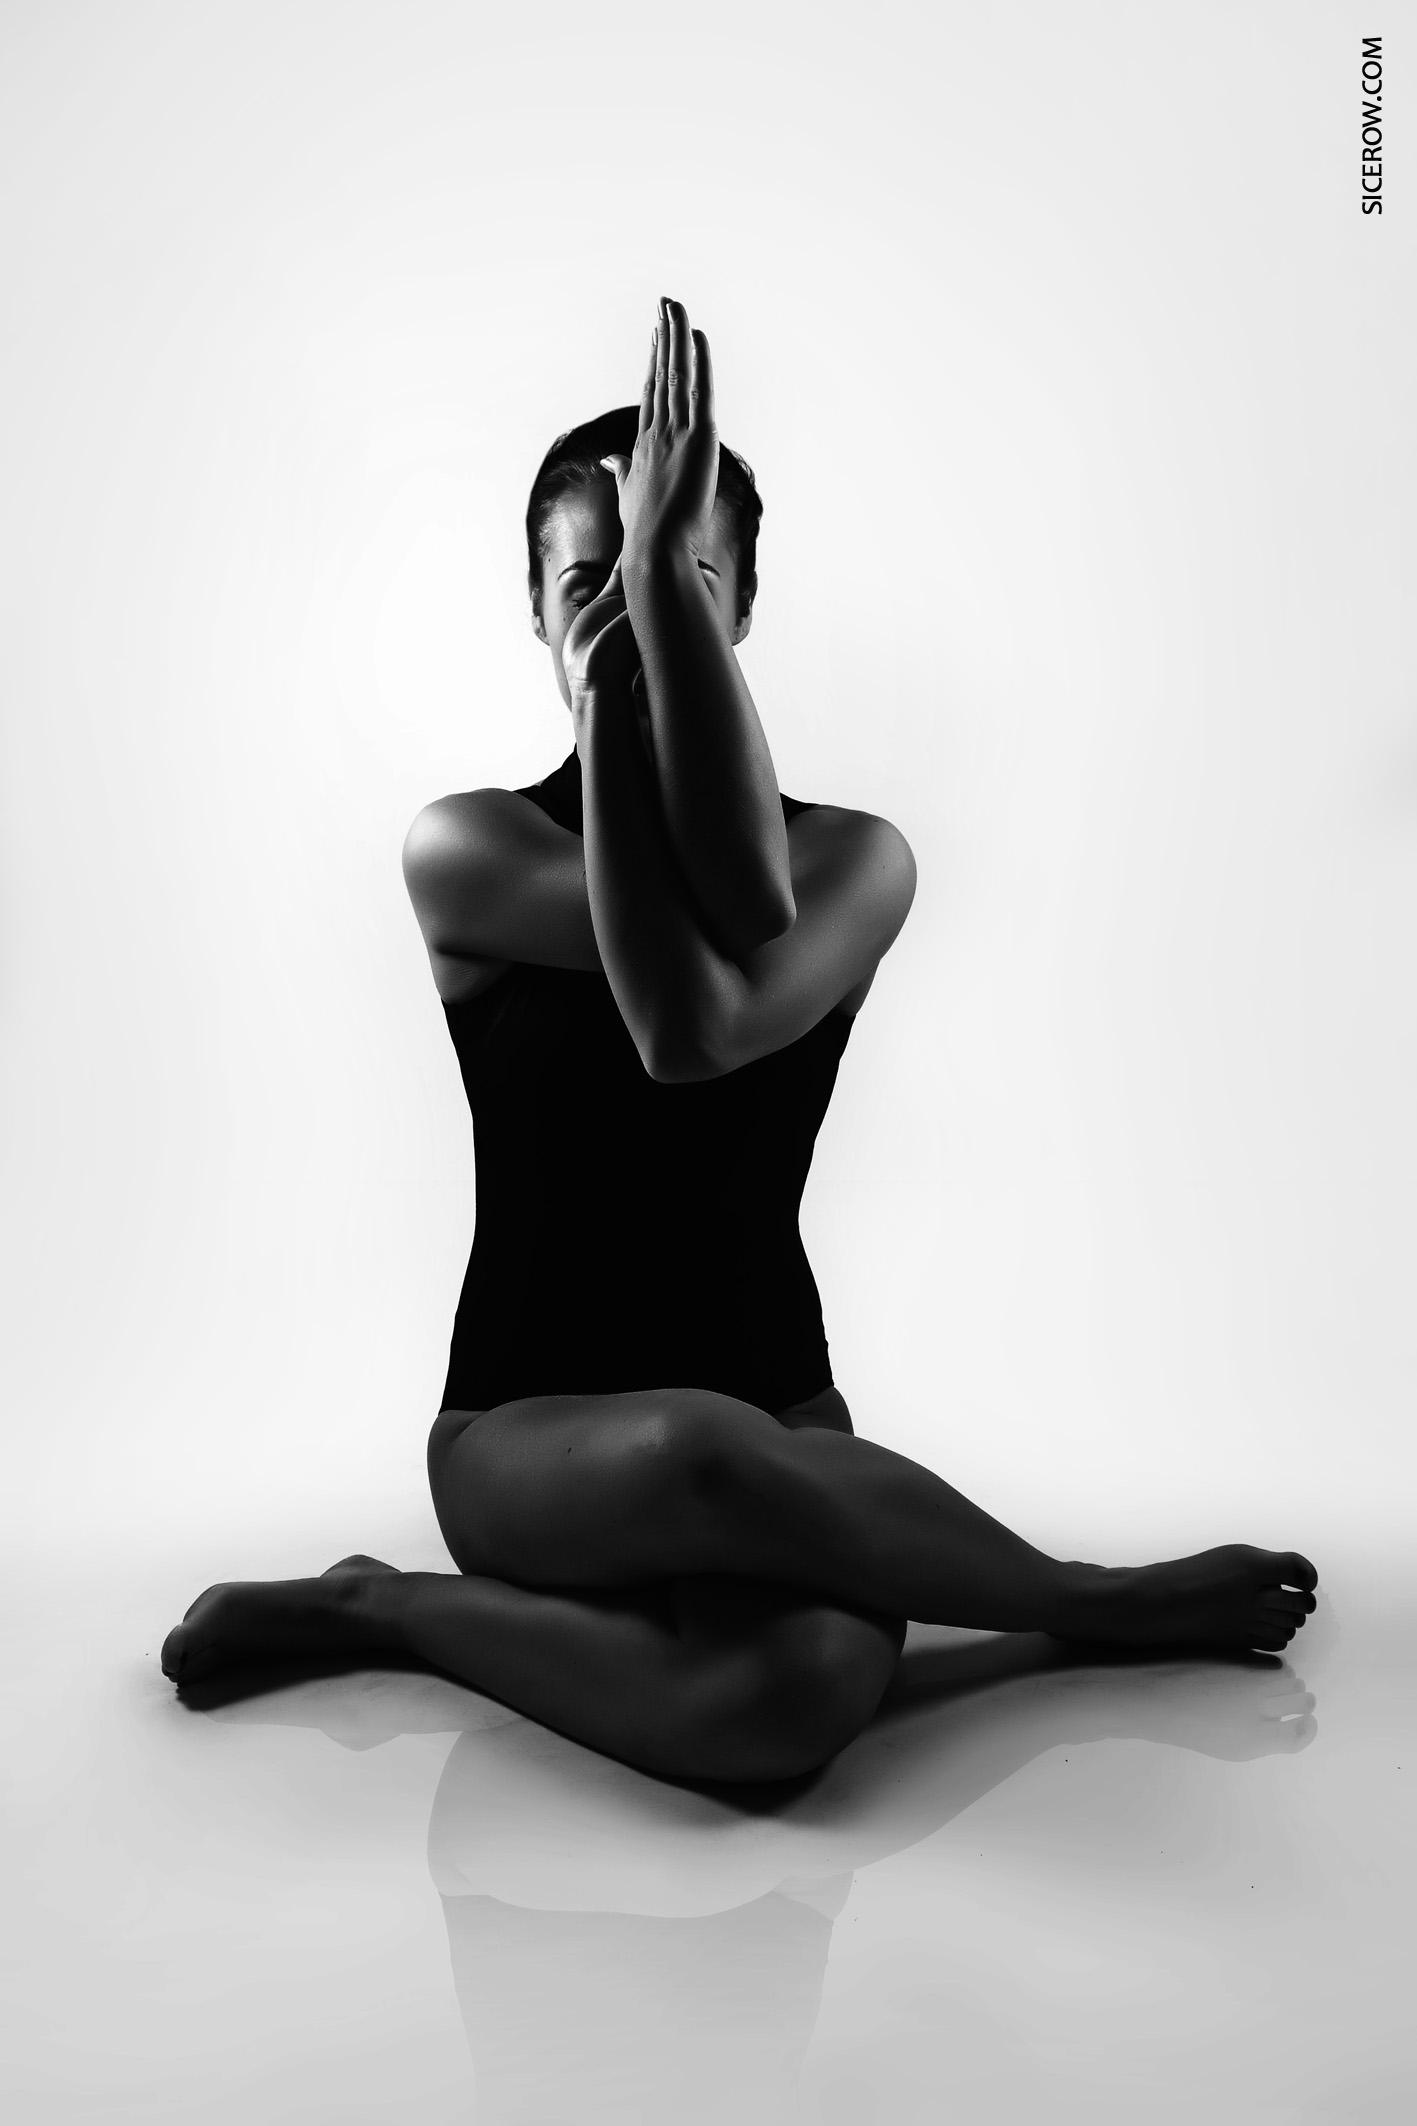 Yogales neem je bij Natraj Yoga